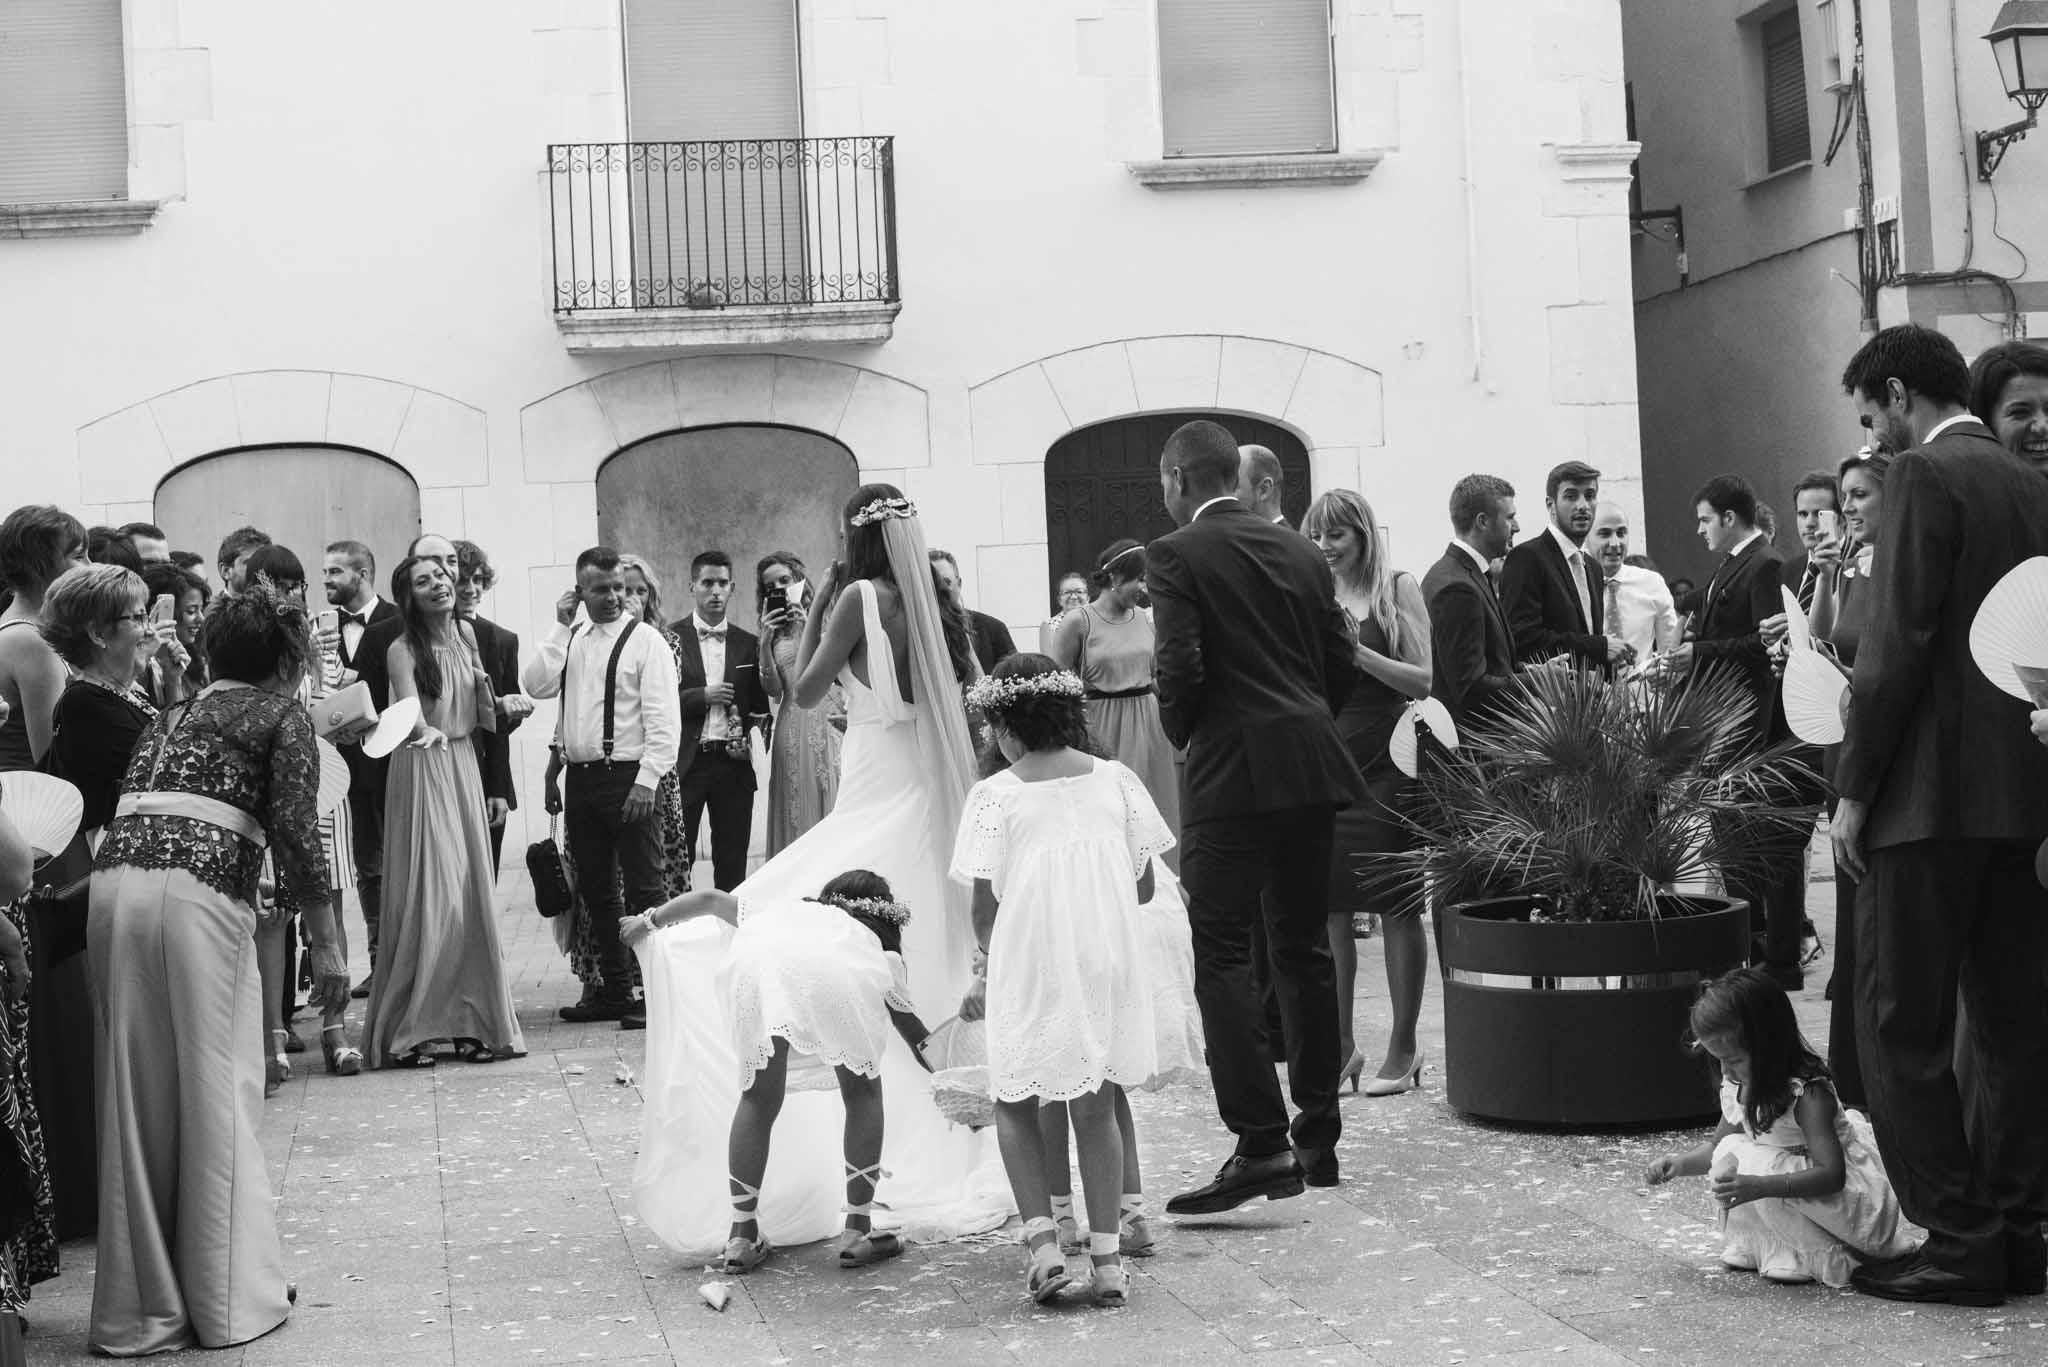 Boda-Heretat-Sabartes-Tarragona-Fotografía-Laura-Arroyo-DSC_8987